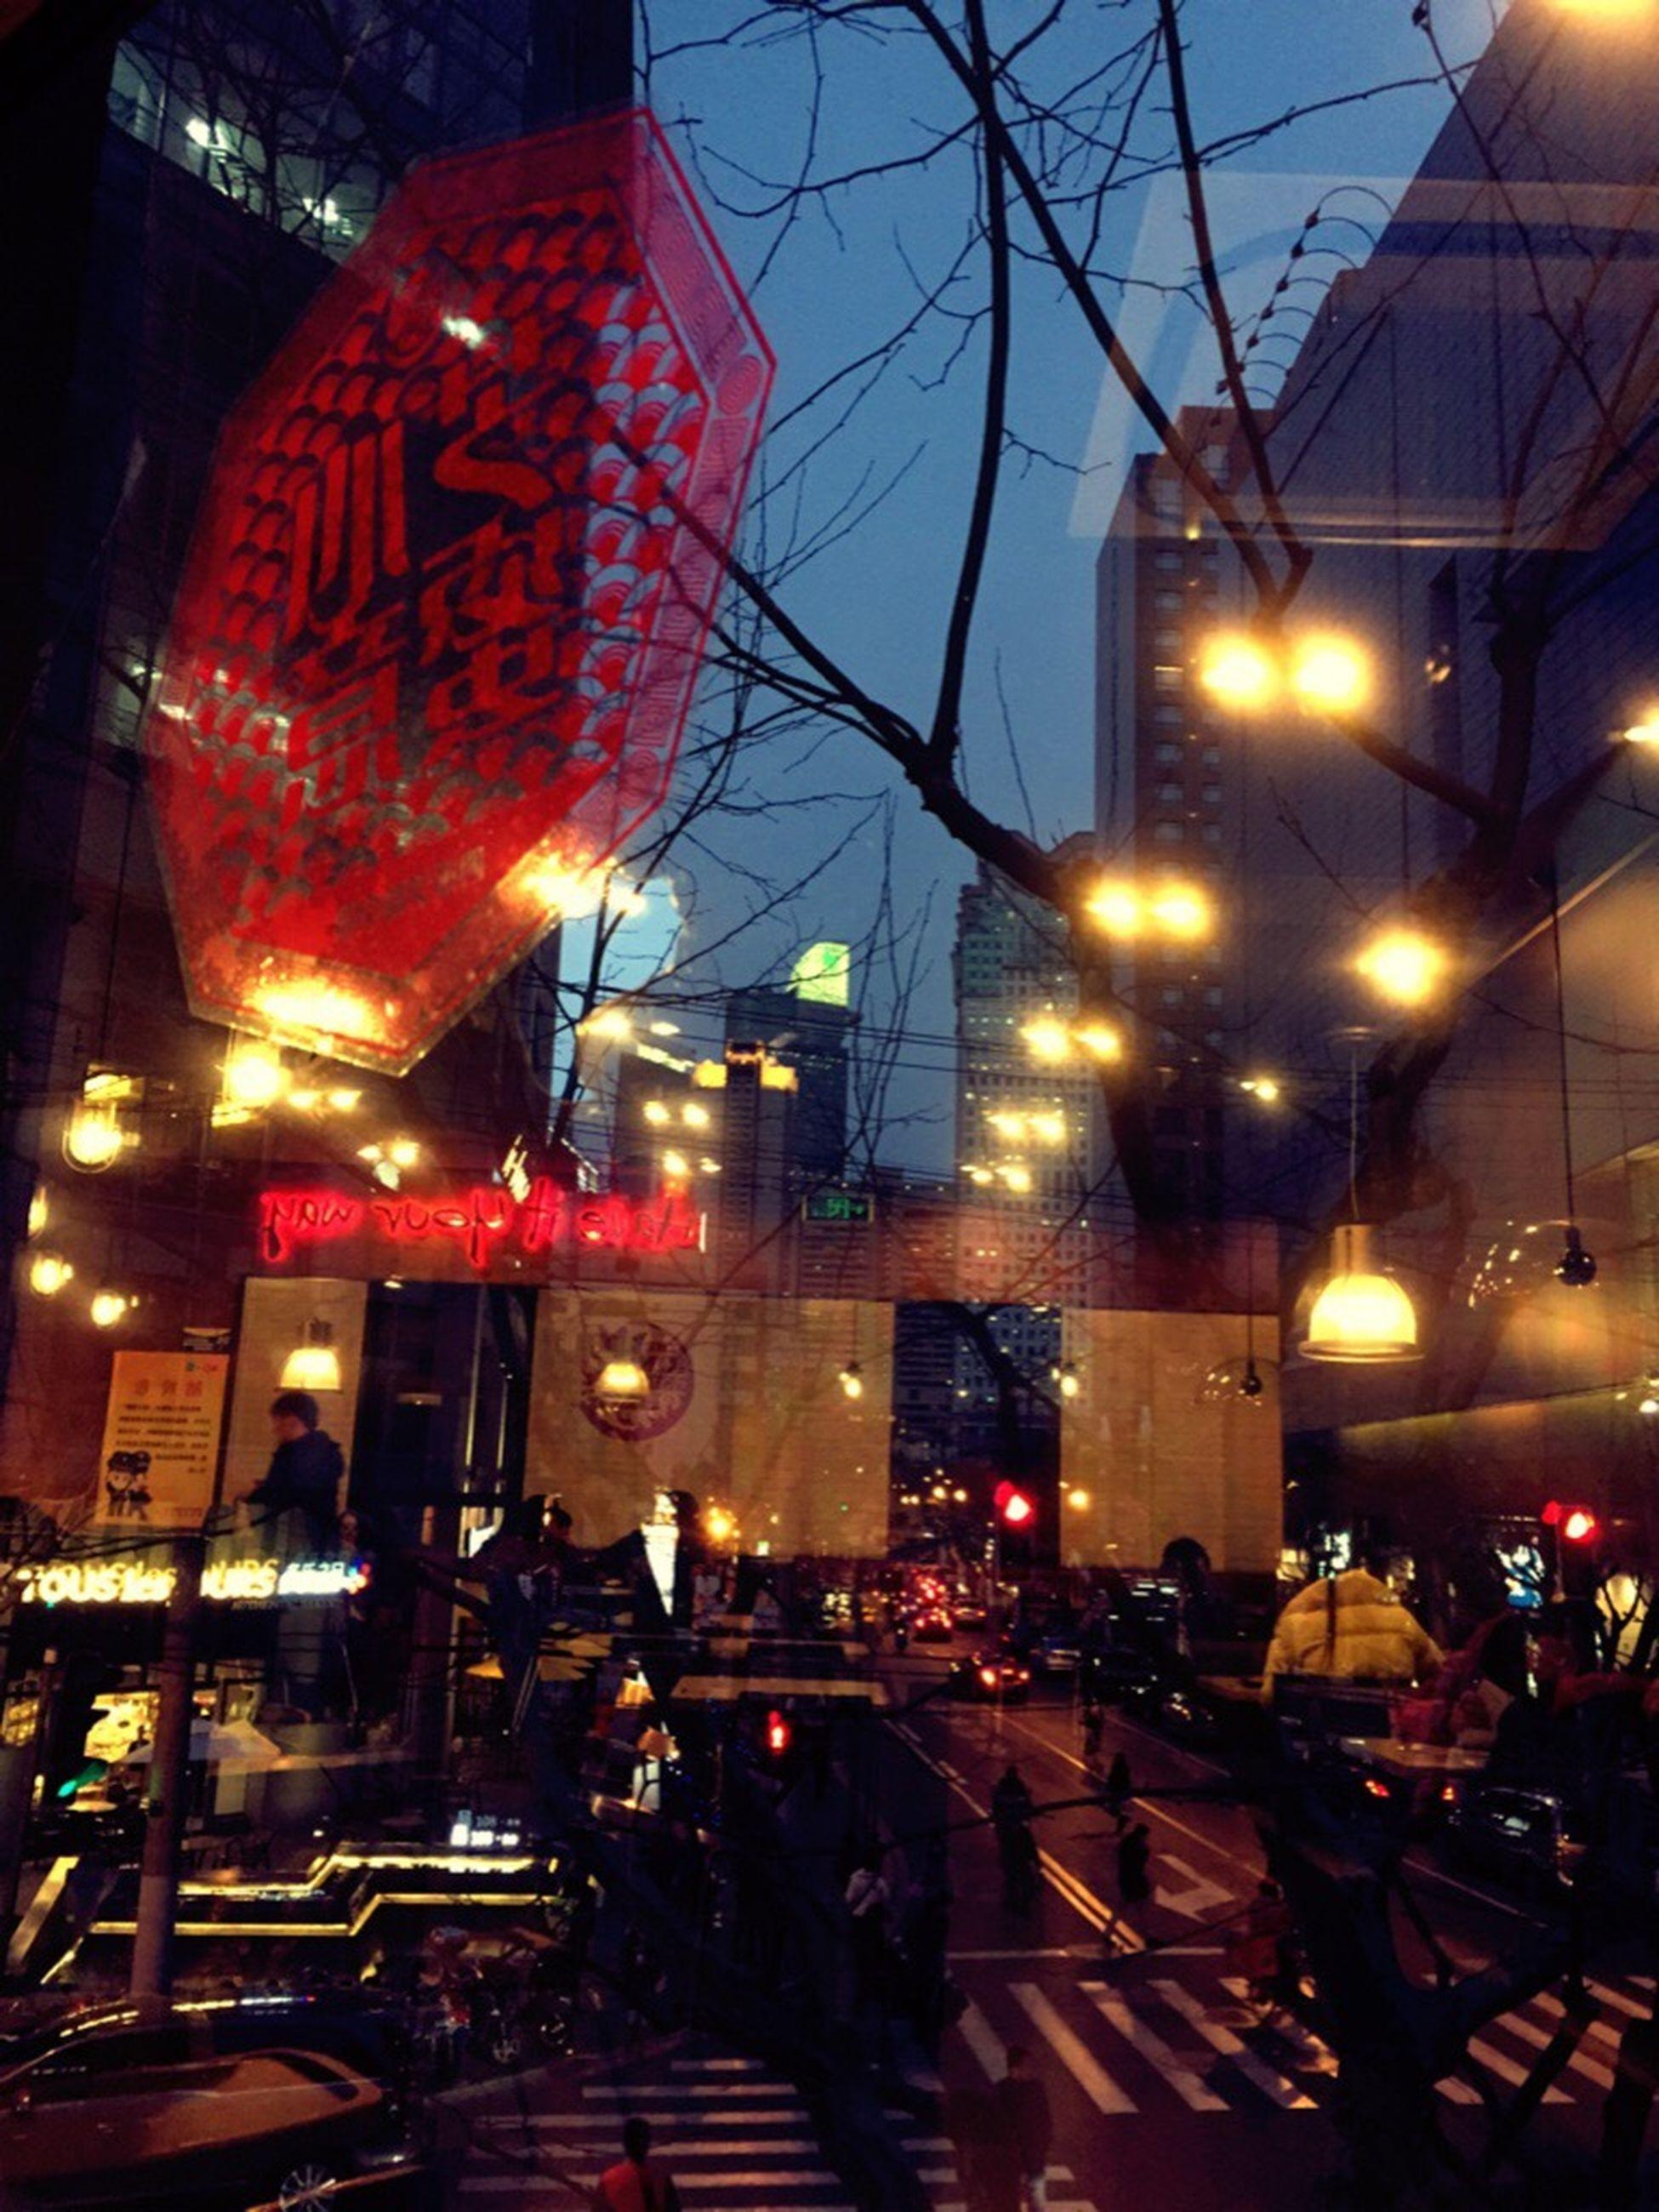 illuminated, building exterior, night, street, city, architecture, street light, built structure, lighting equipment, land vehicle, car, transportation, city street, city life, road, dusk, mode of transport, incidental people, sky, outdoors